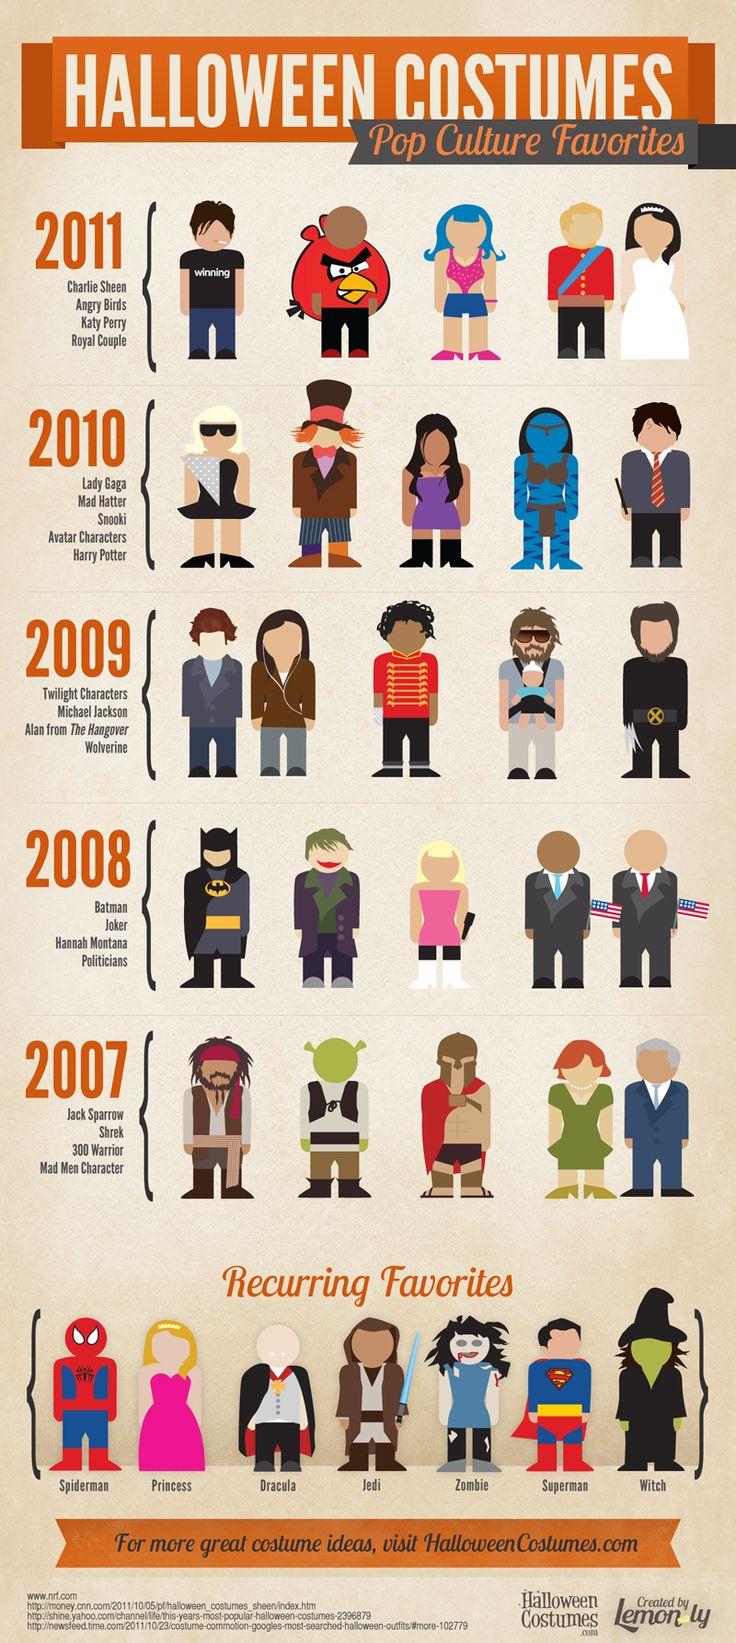 Pop Culture Halloween Costume Favorites #Halloween #halloweencostumes